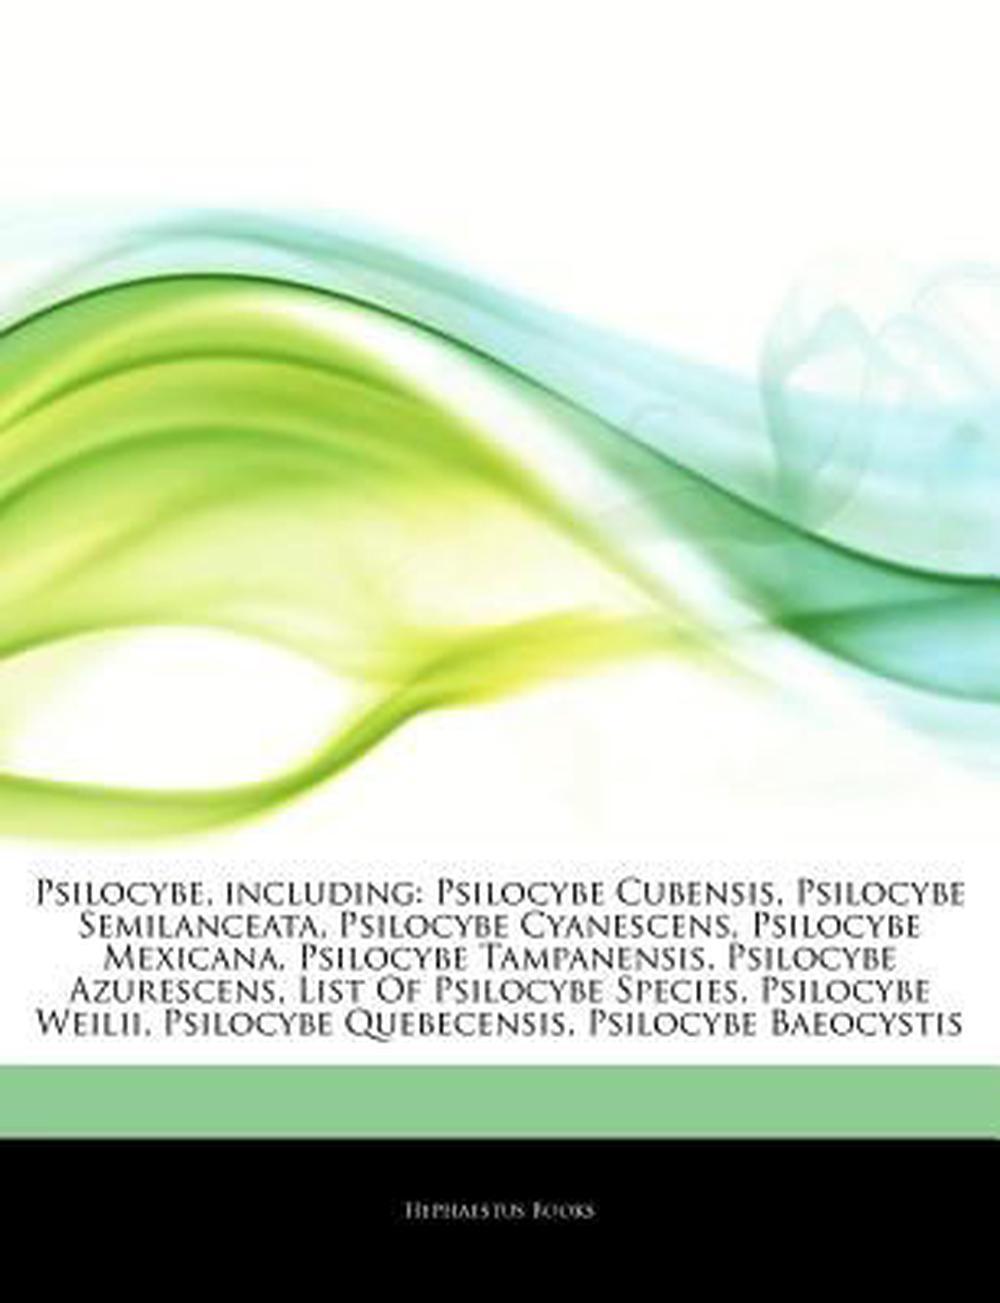 Psilocybe, including: Psilocybe Cubensis, Psilocybe